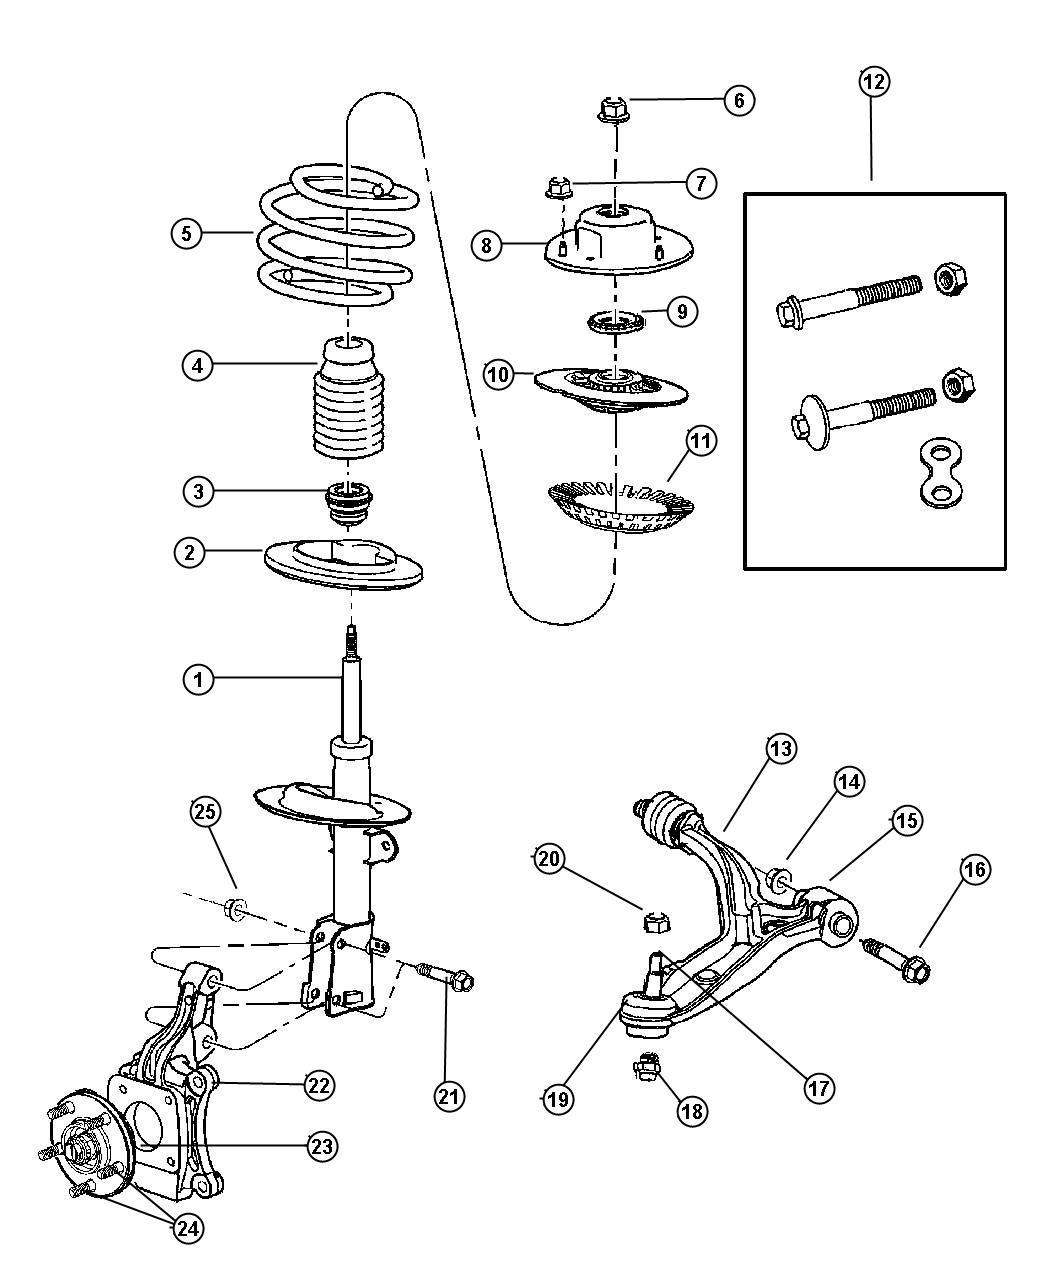 Jeep Wrangler Arm Control Right Suspension